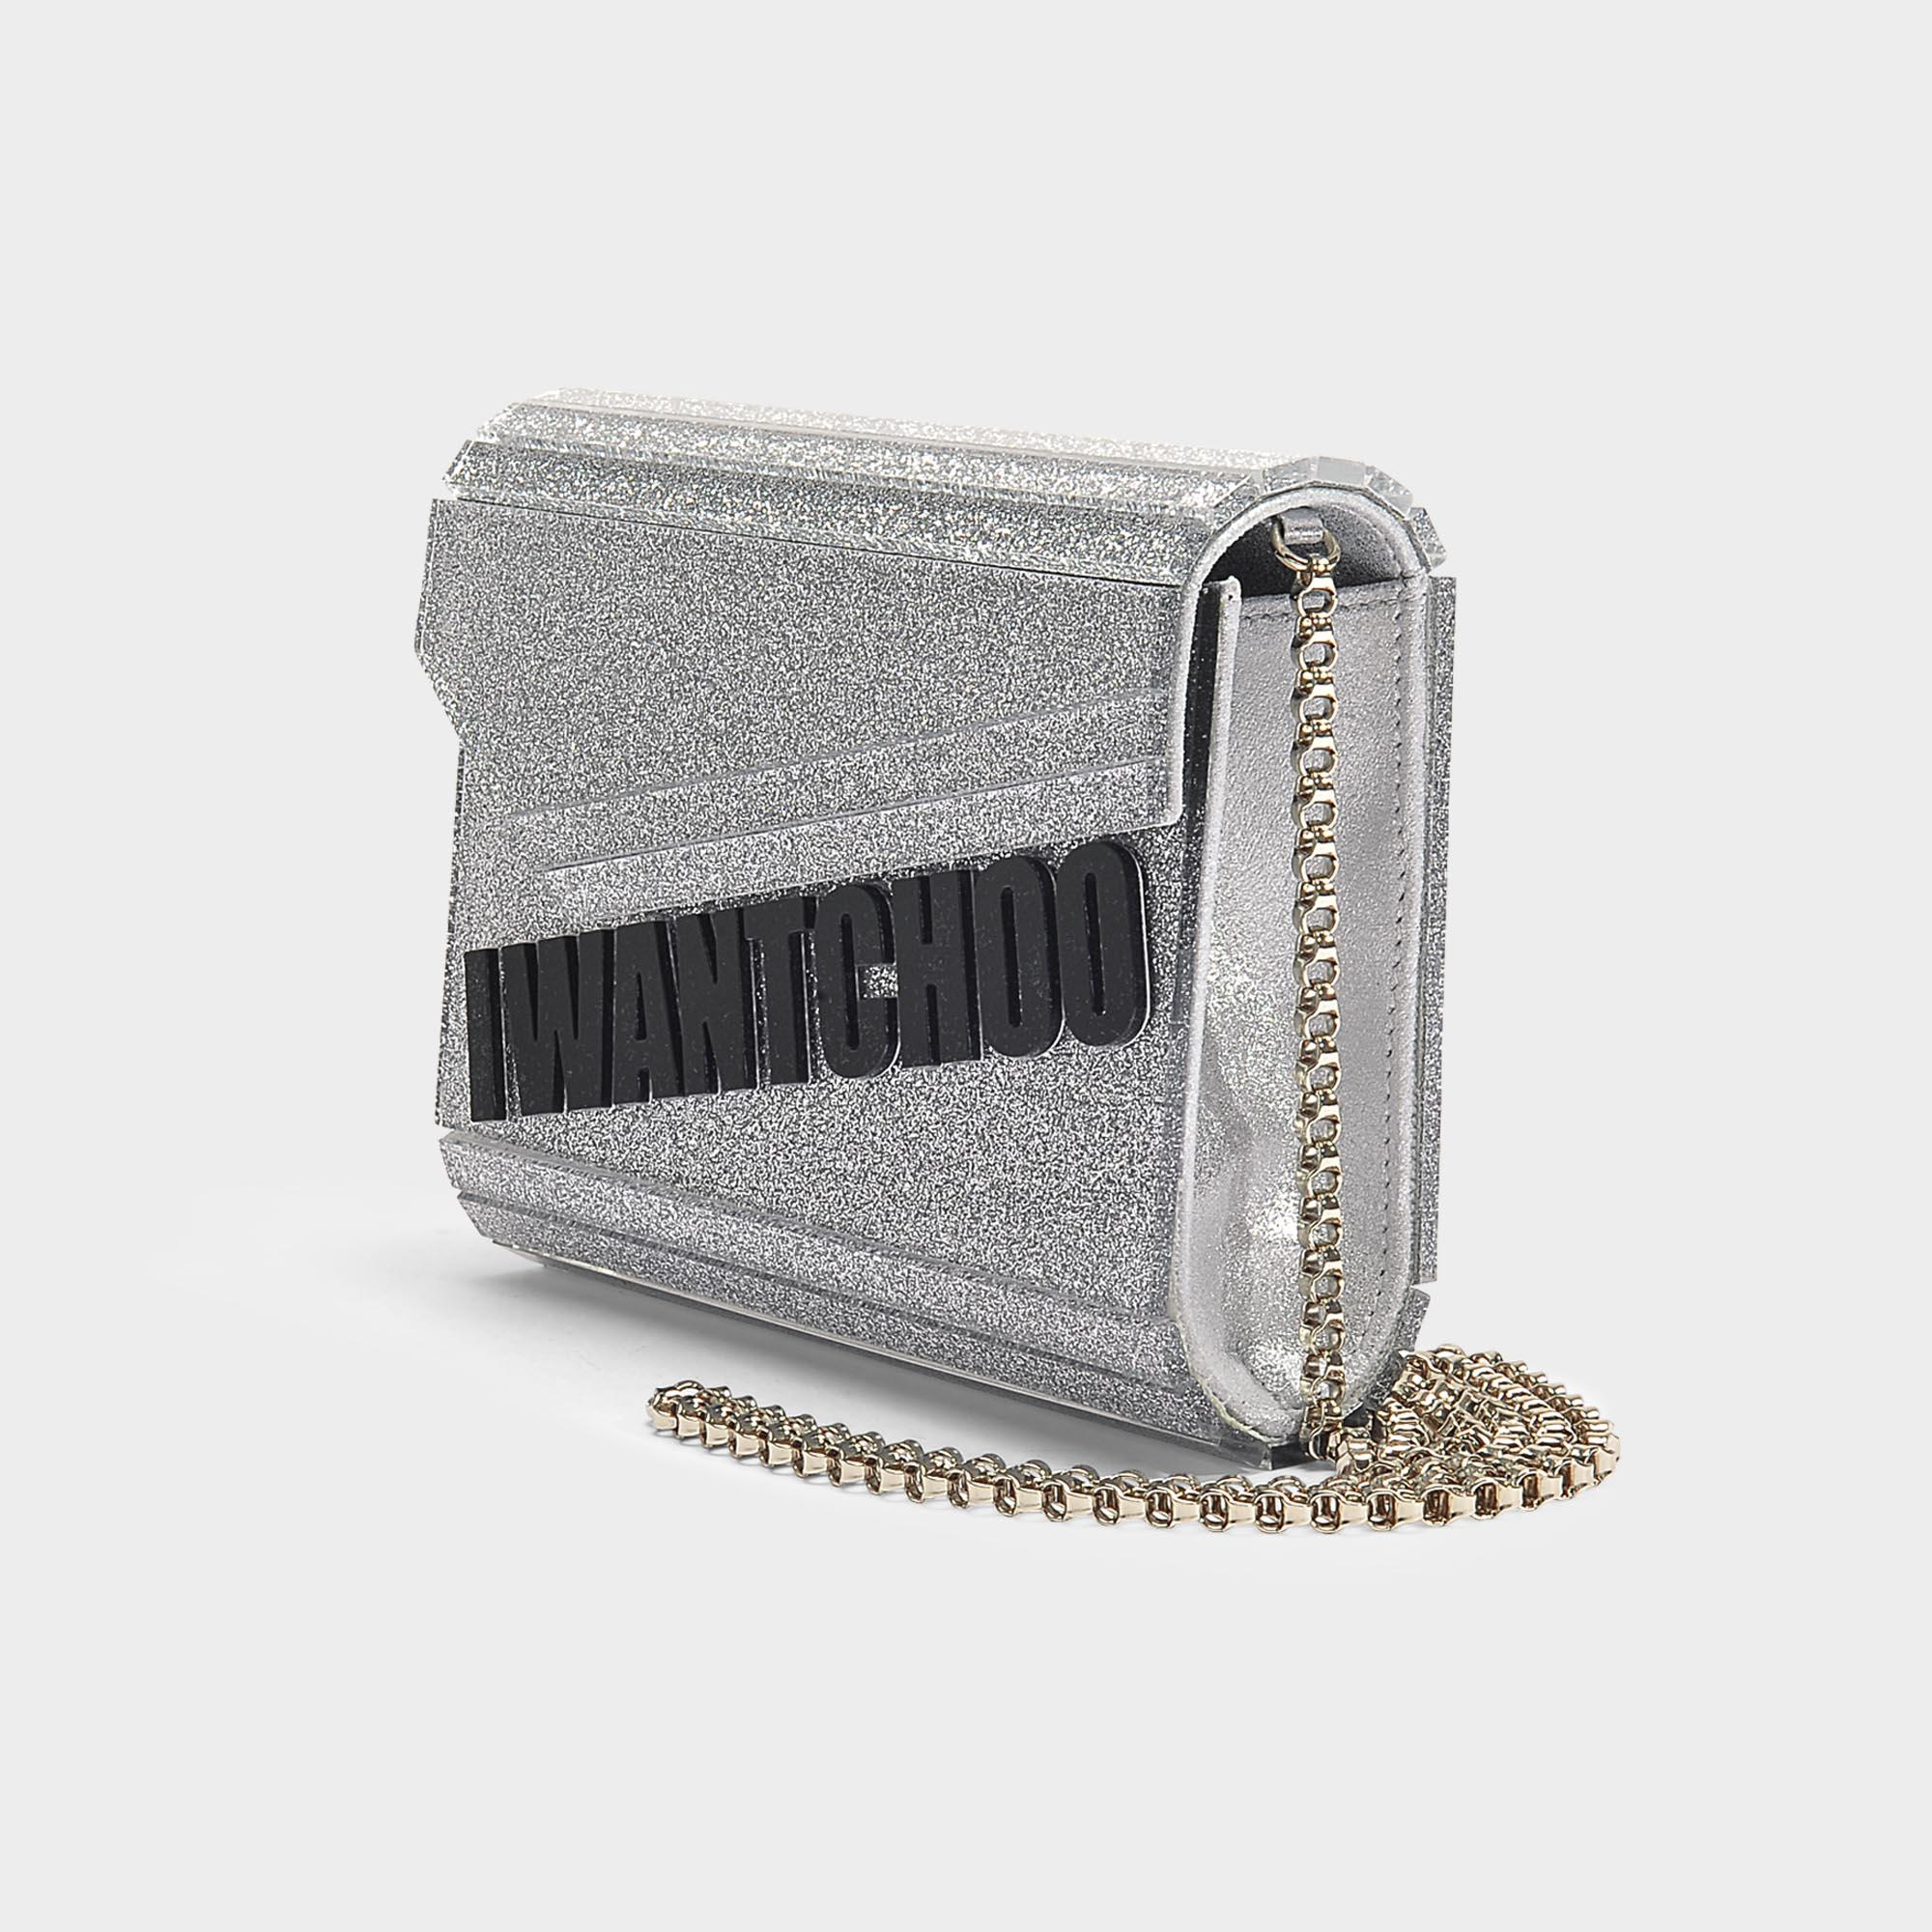 ff0a216140ec9 Lyst - Jimmy Choo  i Want Choo  Glitter Candy Clutch In Silver ...